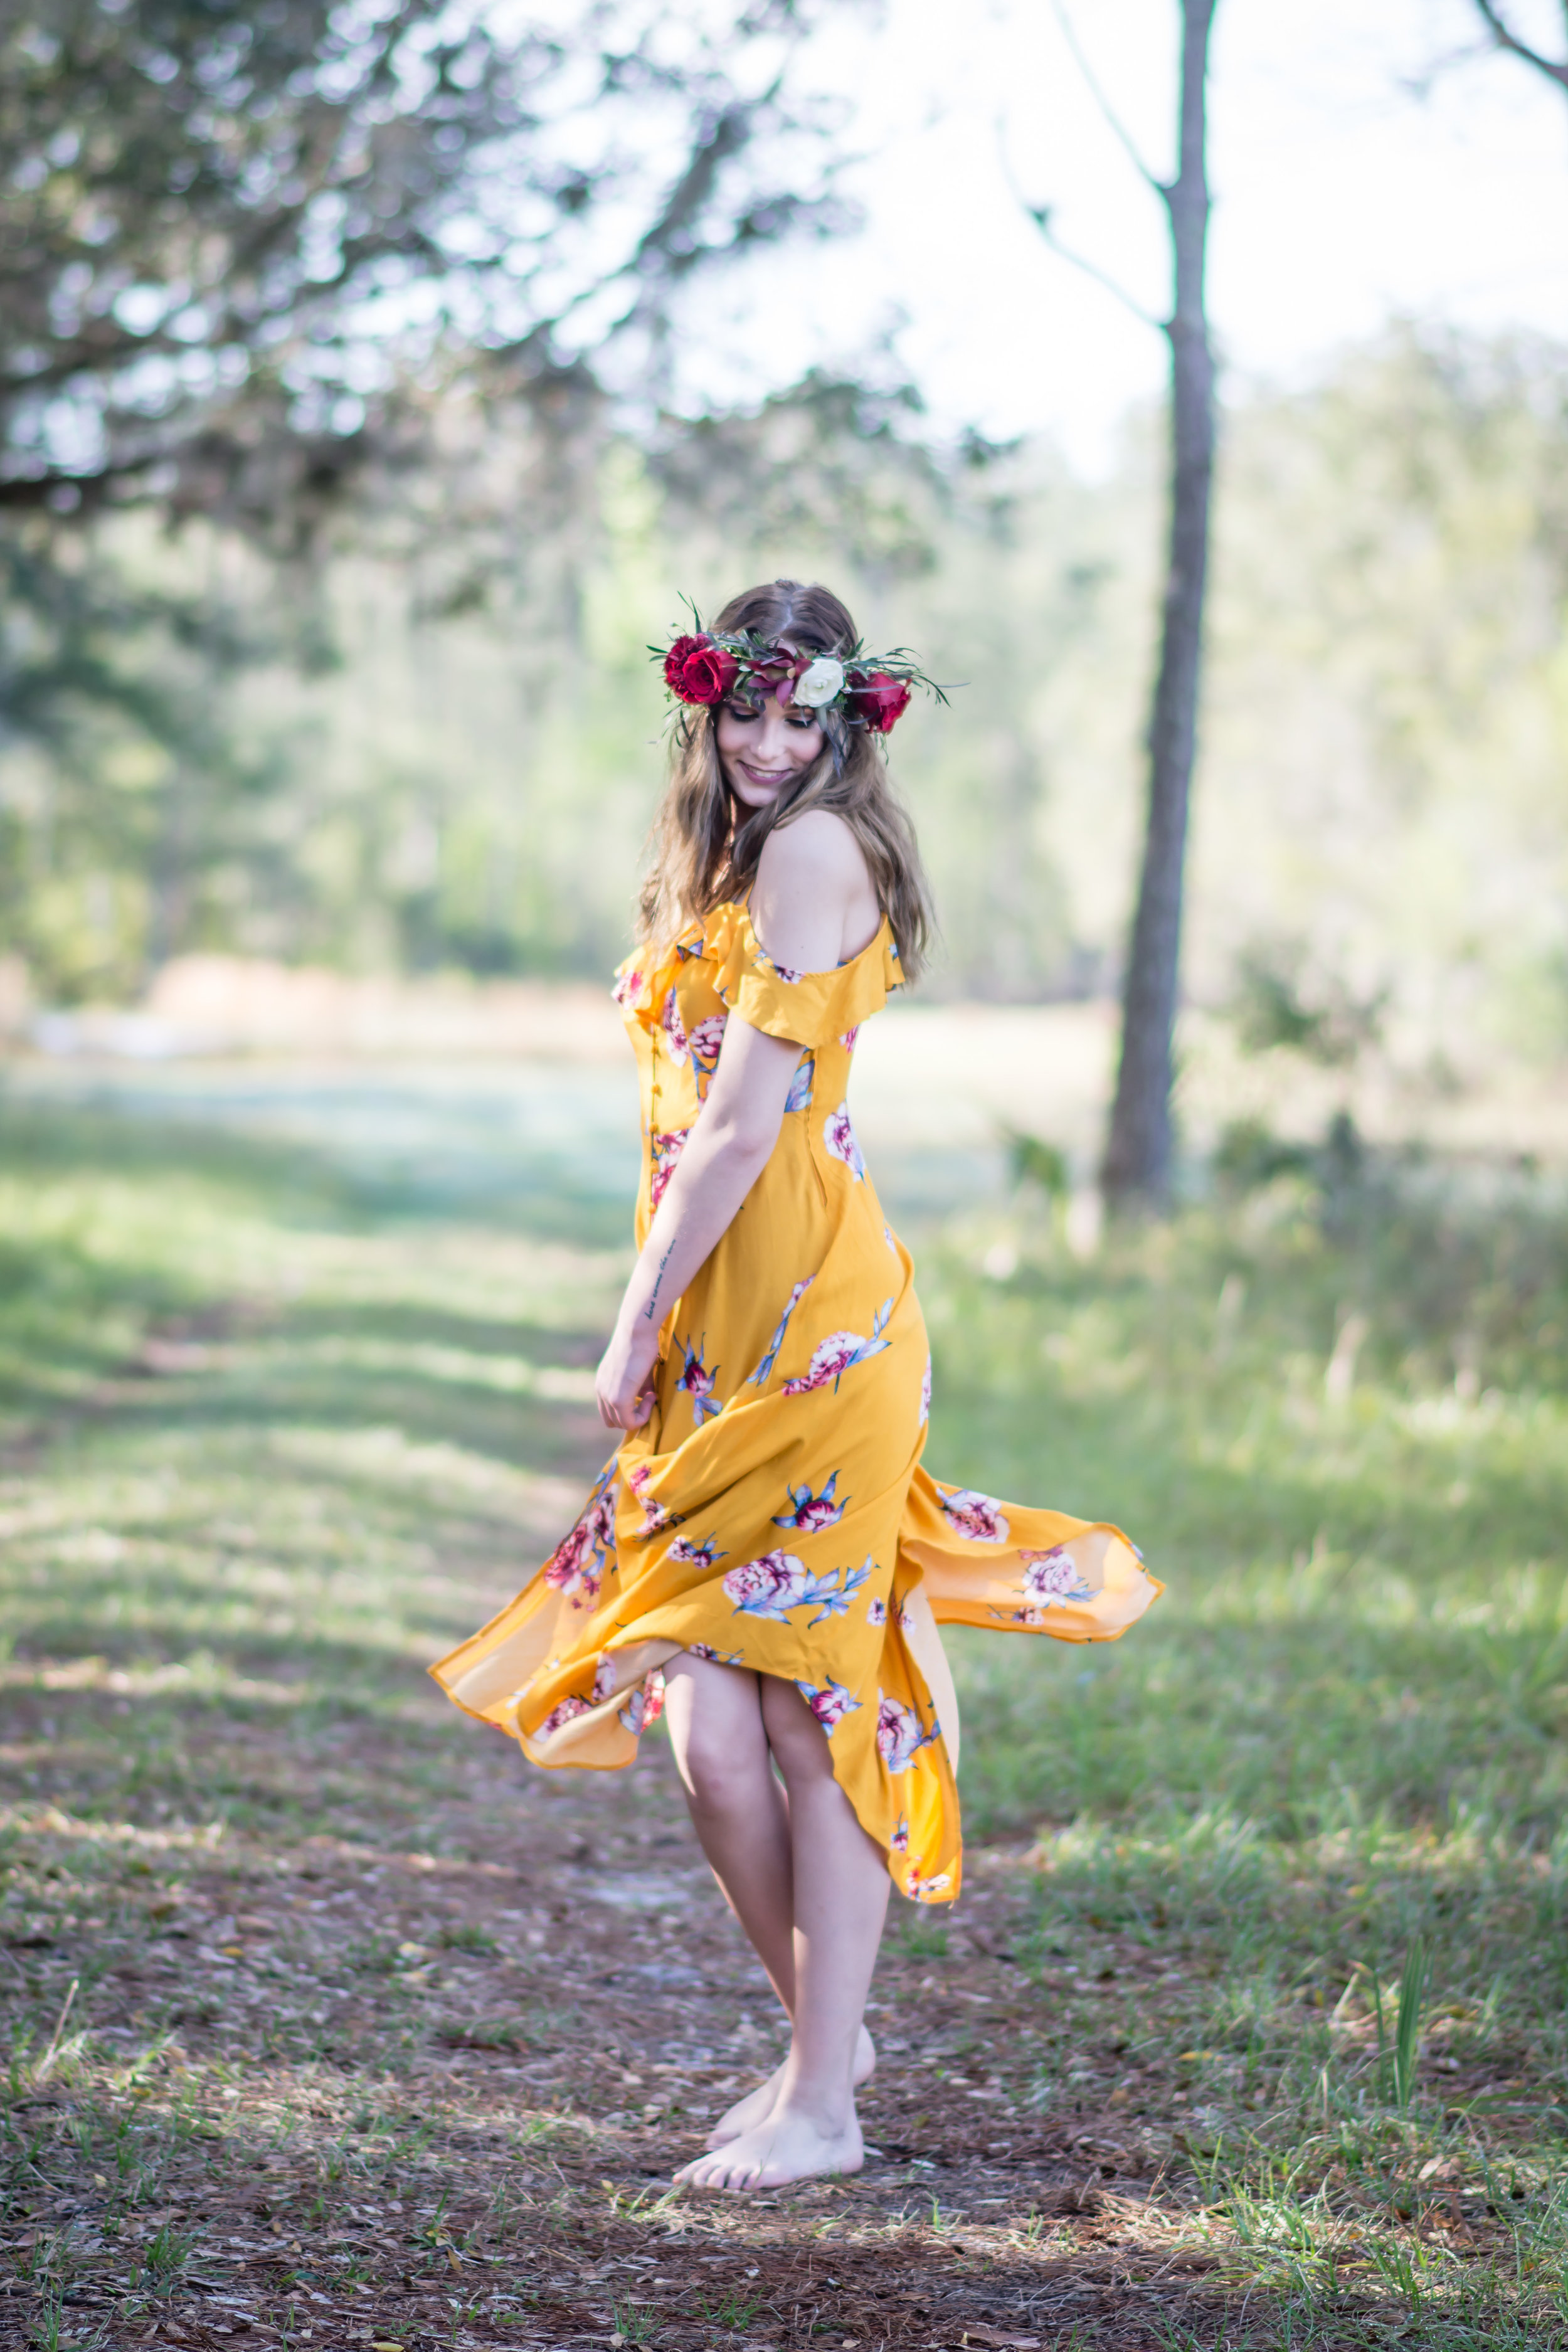 floral-headpiece-fashion-photoshoot-geneva-central-florida-photographer-yanitza-ninett-3.jpg